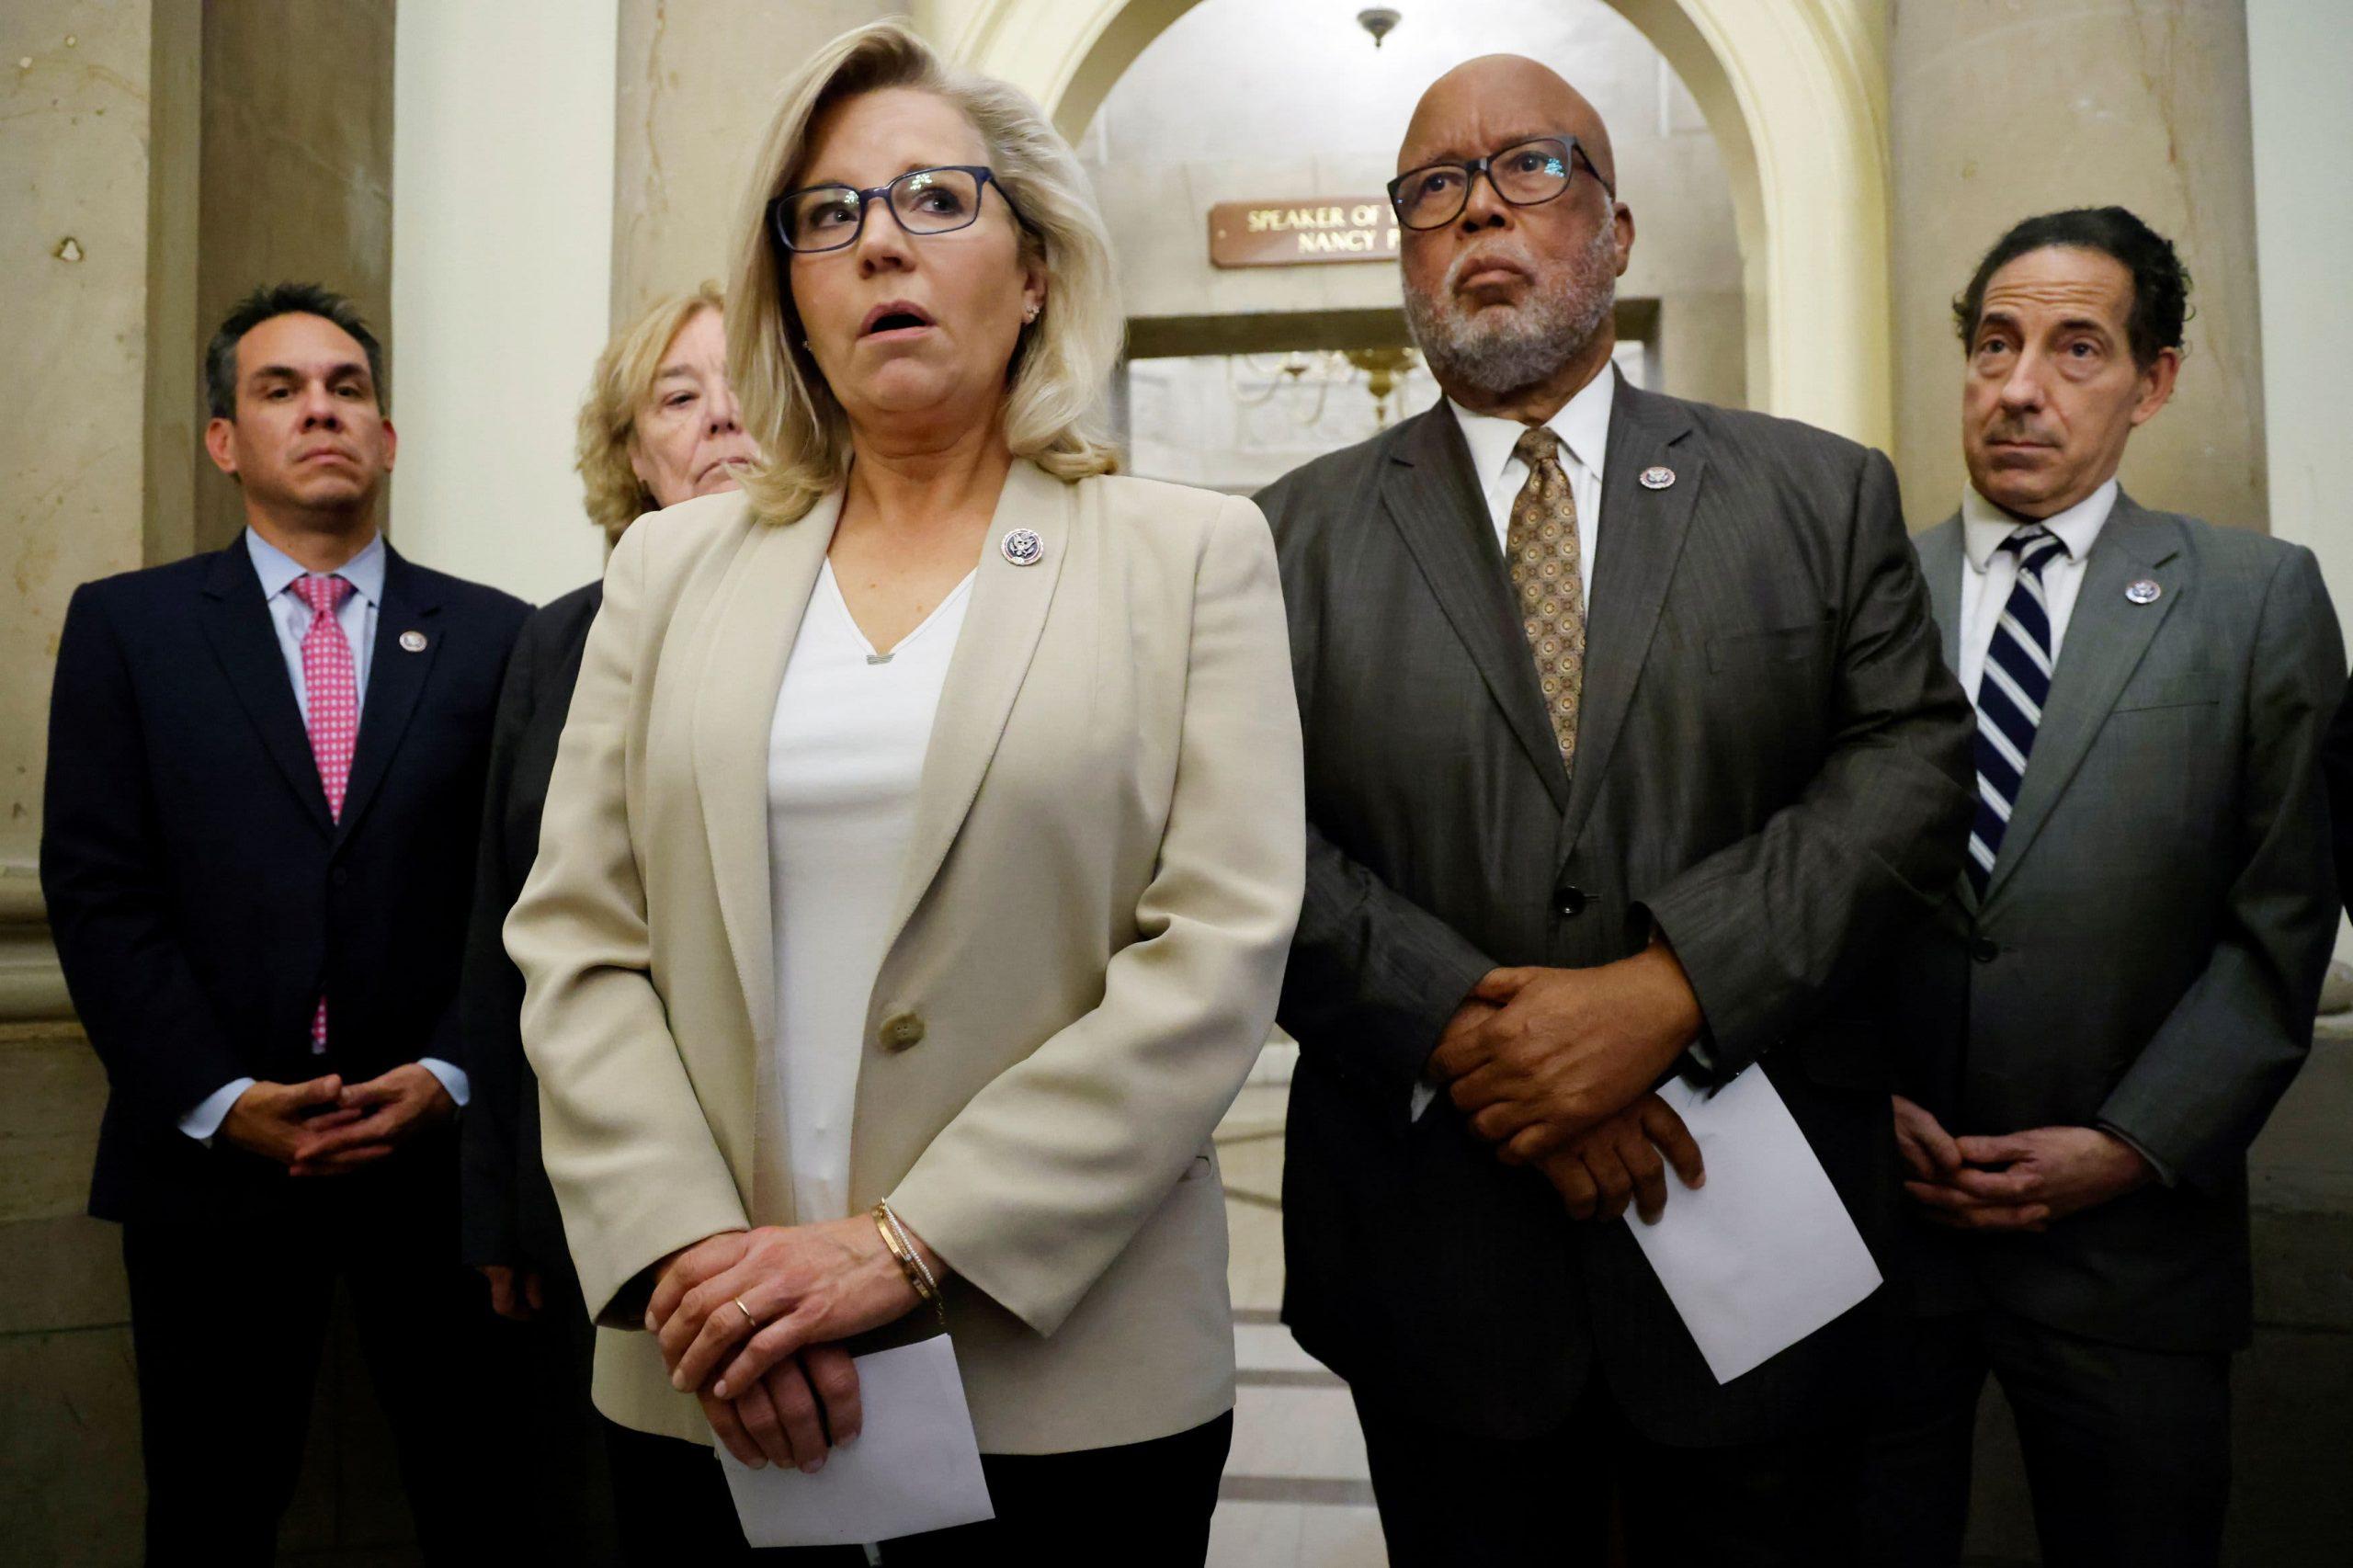 Pelosi nombra a 8 miembros del comité del 6 de enero, incluida la republicana Liz Cheney, para investigar disturbios pro-Trump